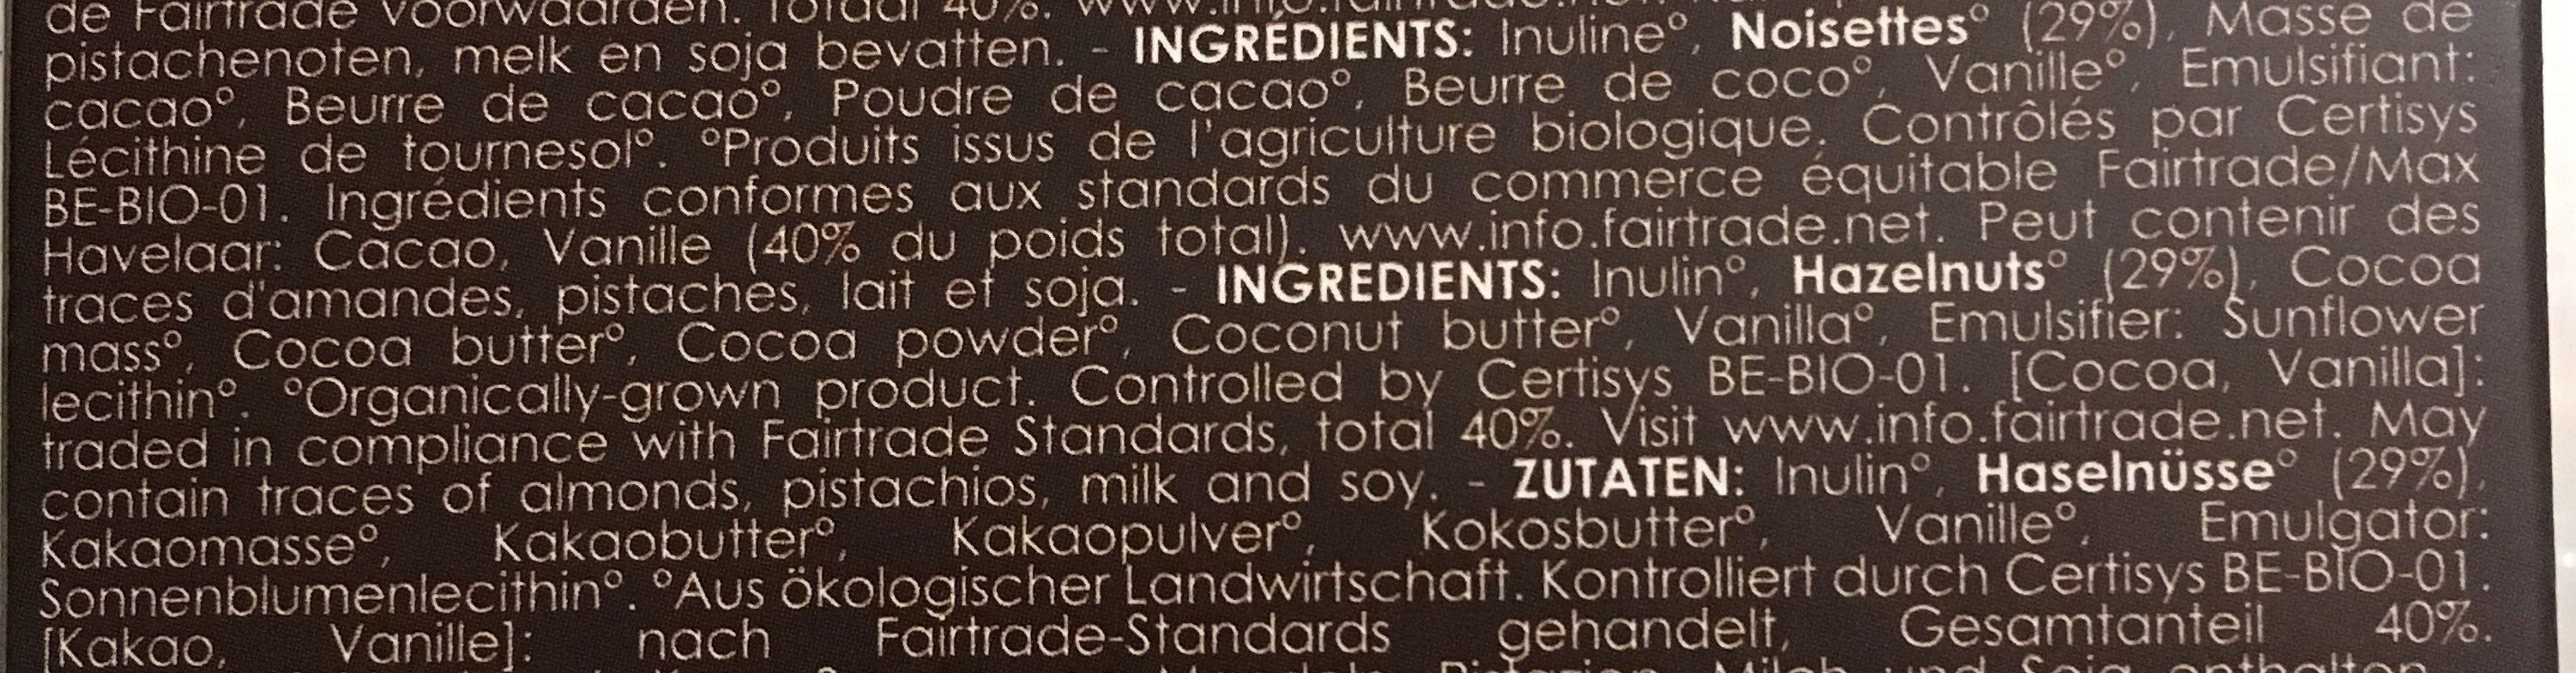 Truffes - Ingredients - fr